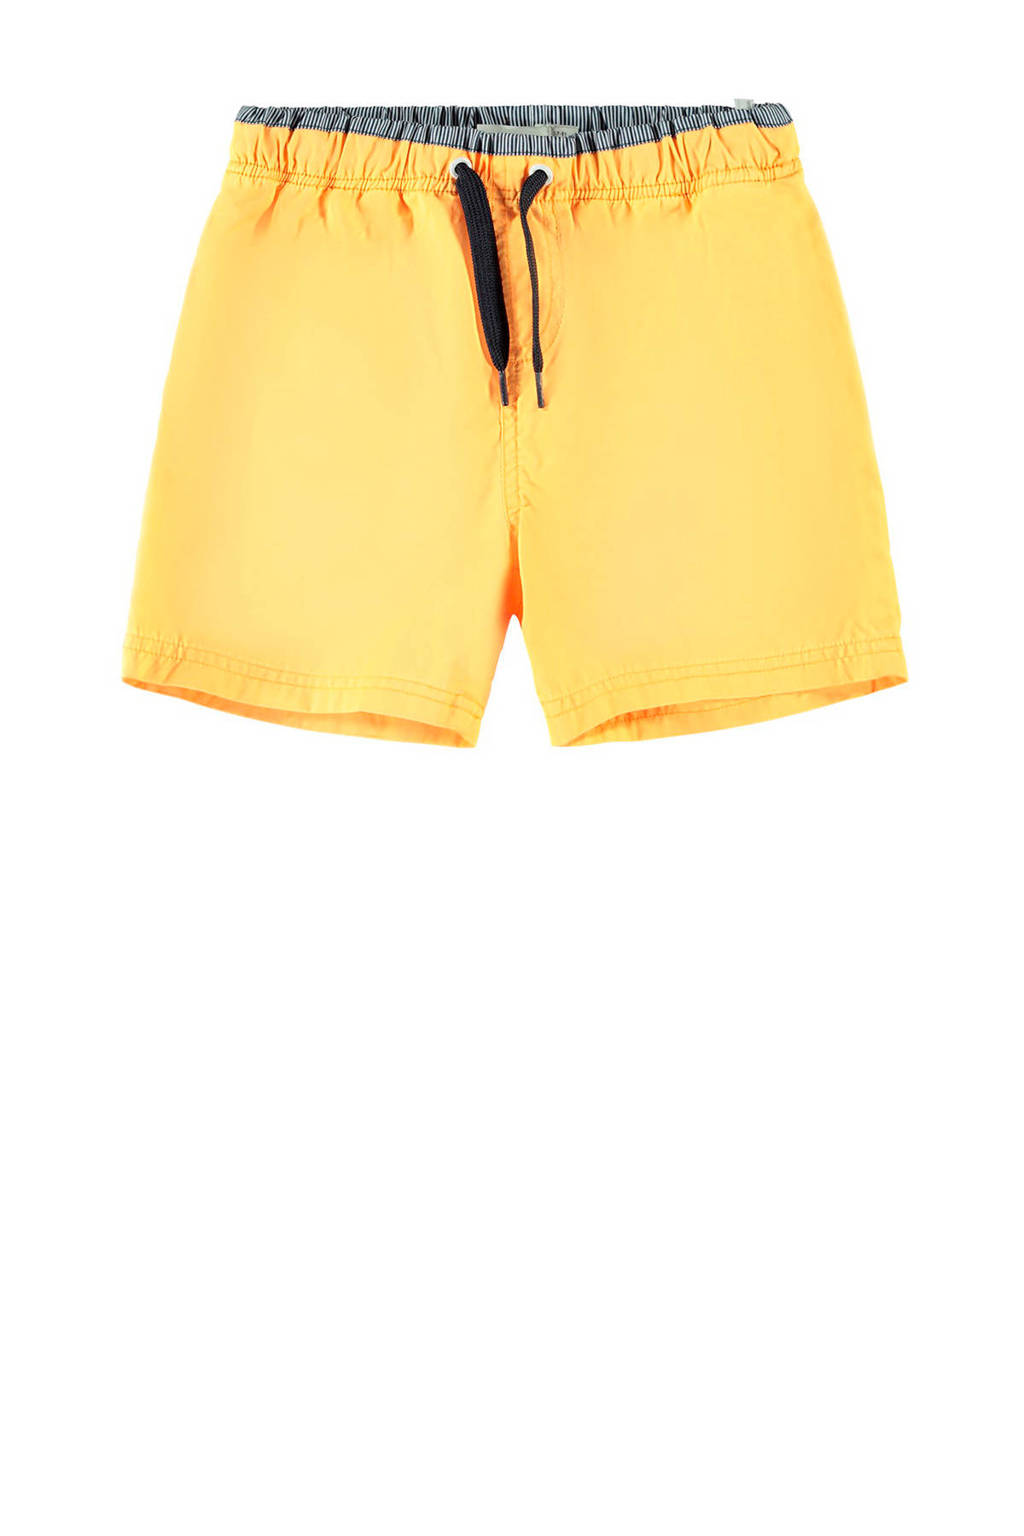 NAME IT zwemshort uni geel, Geel